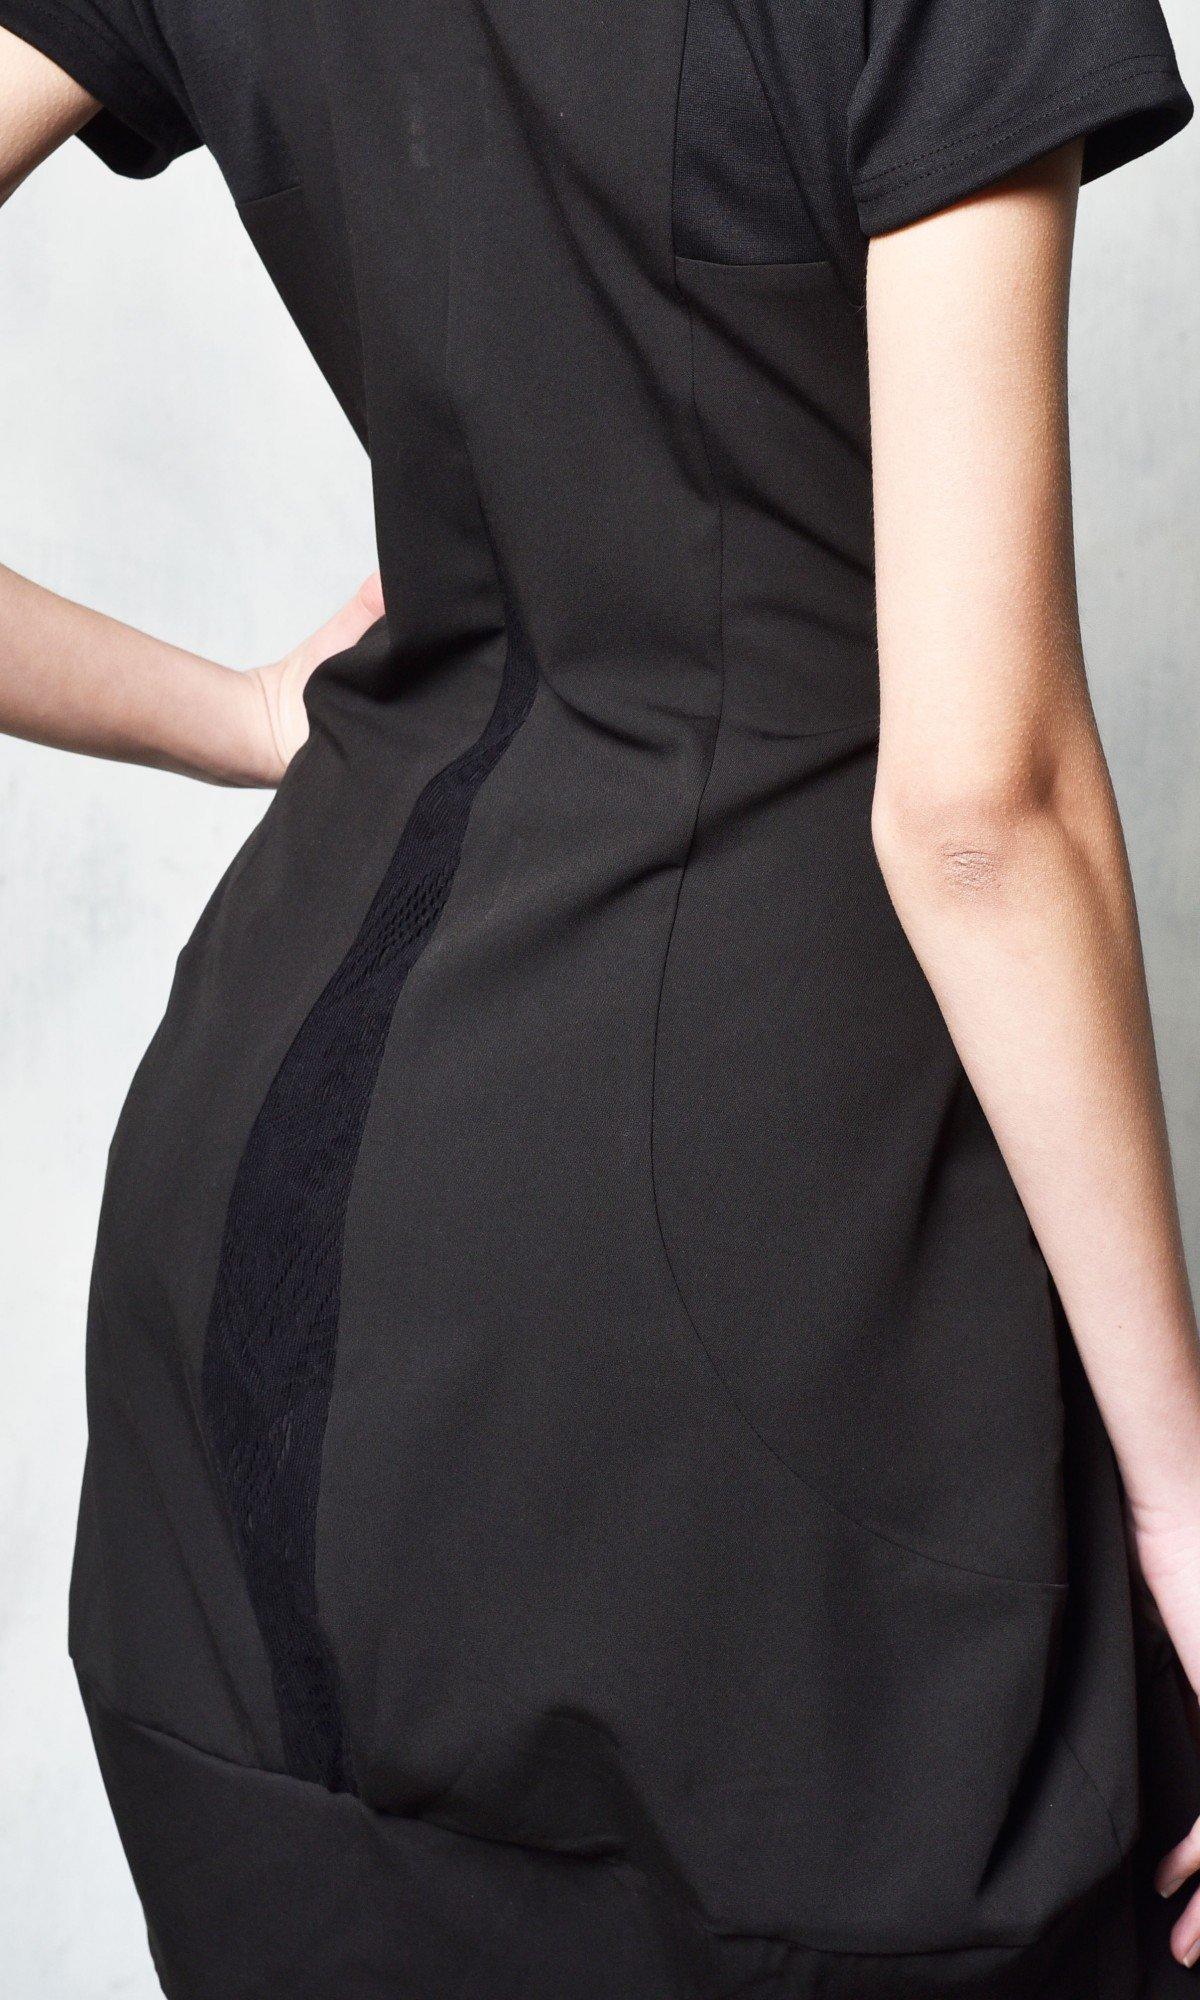 Sexy Black Tunic Dress A03493